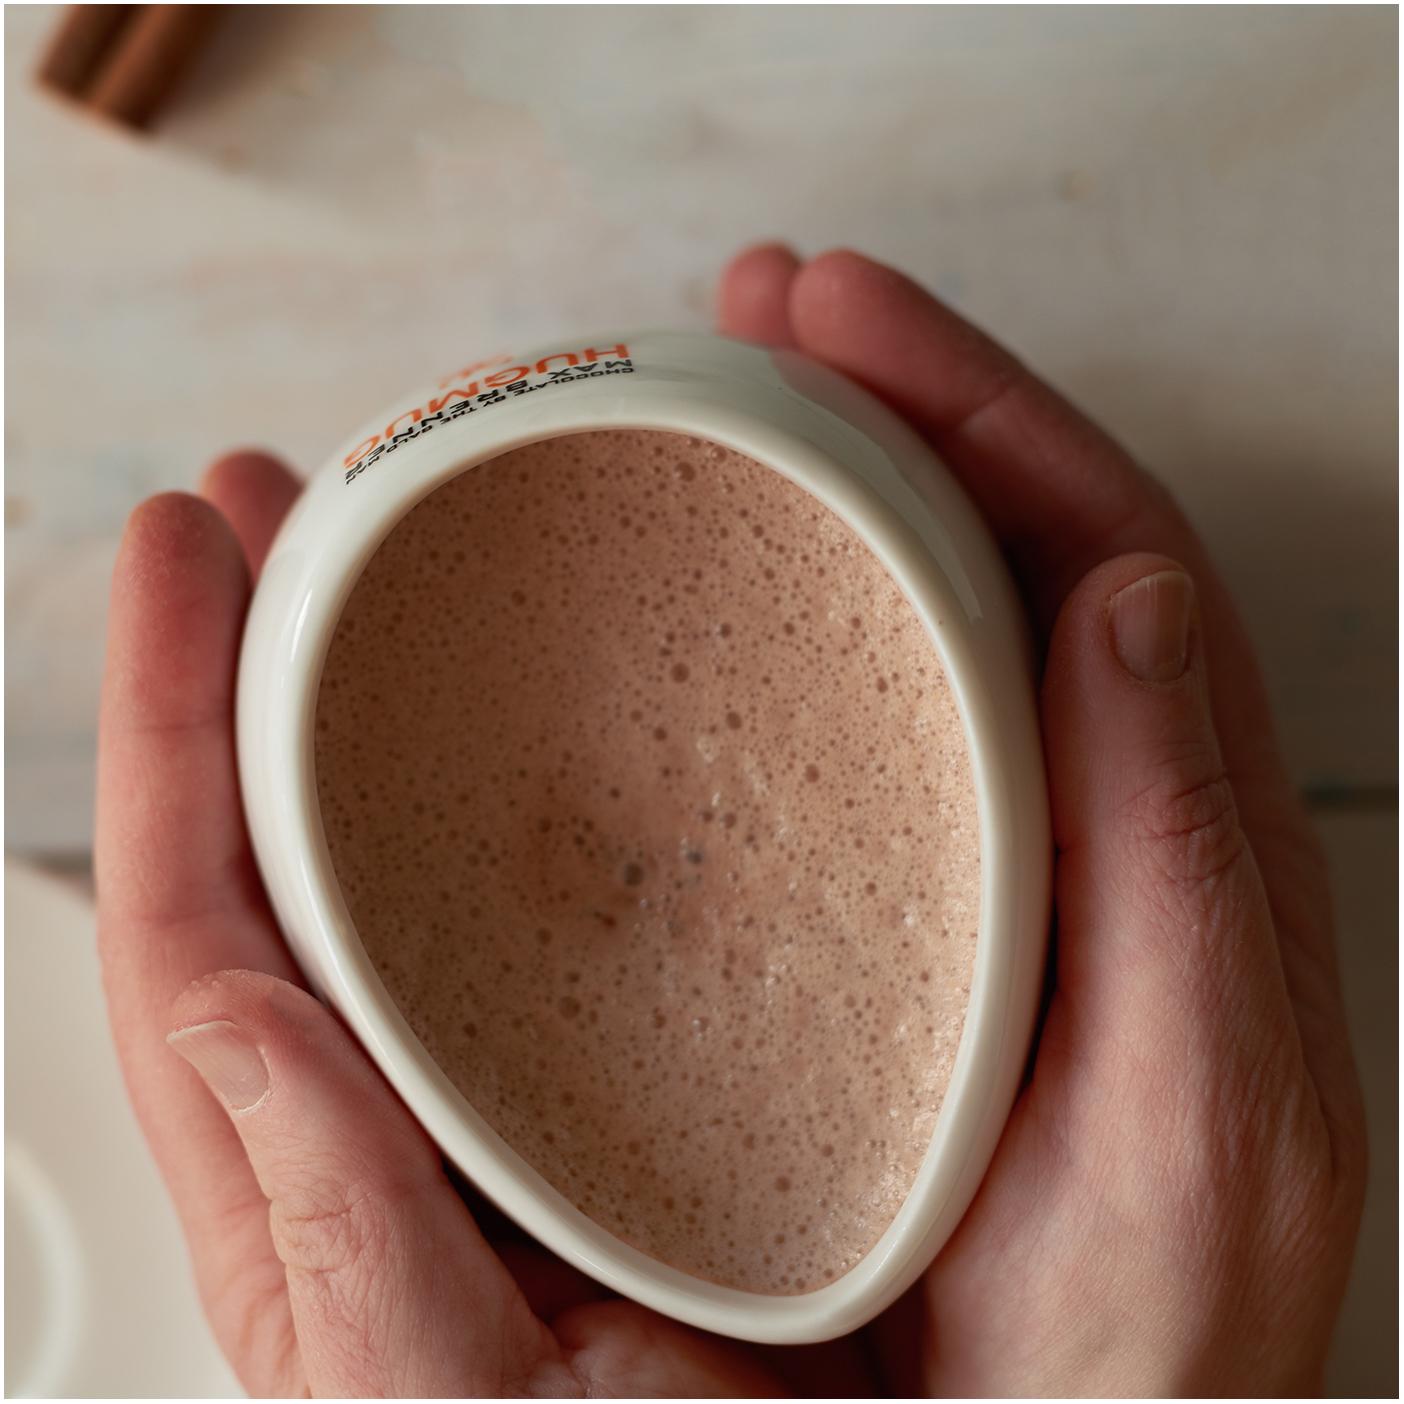 Served in my favourite hug mug. Bliss!